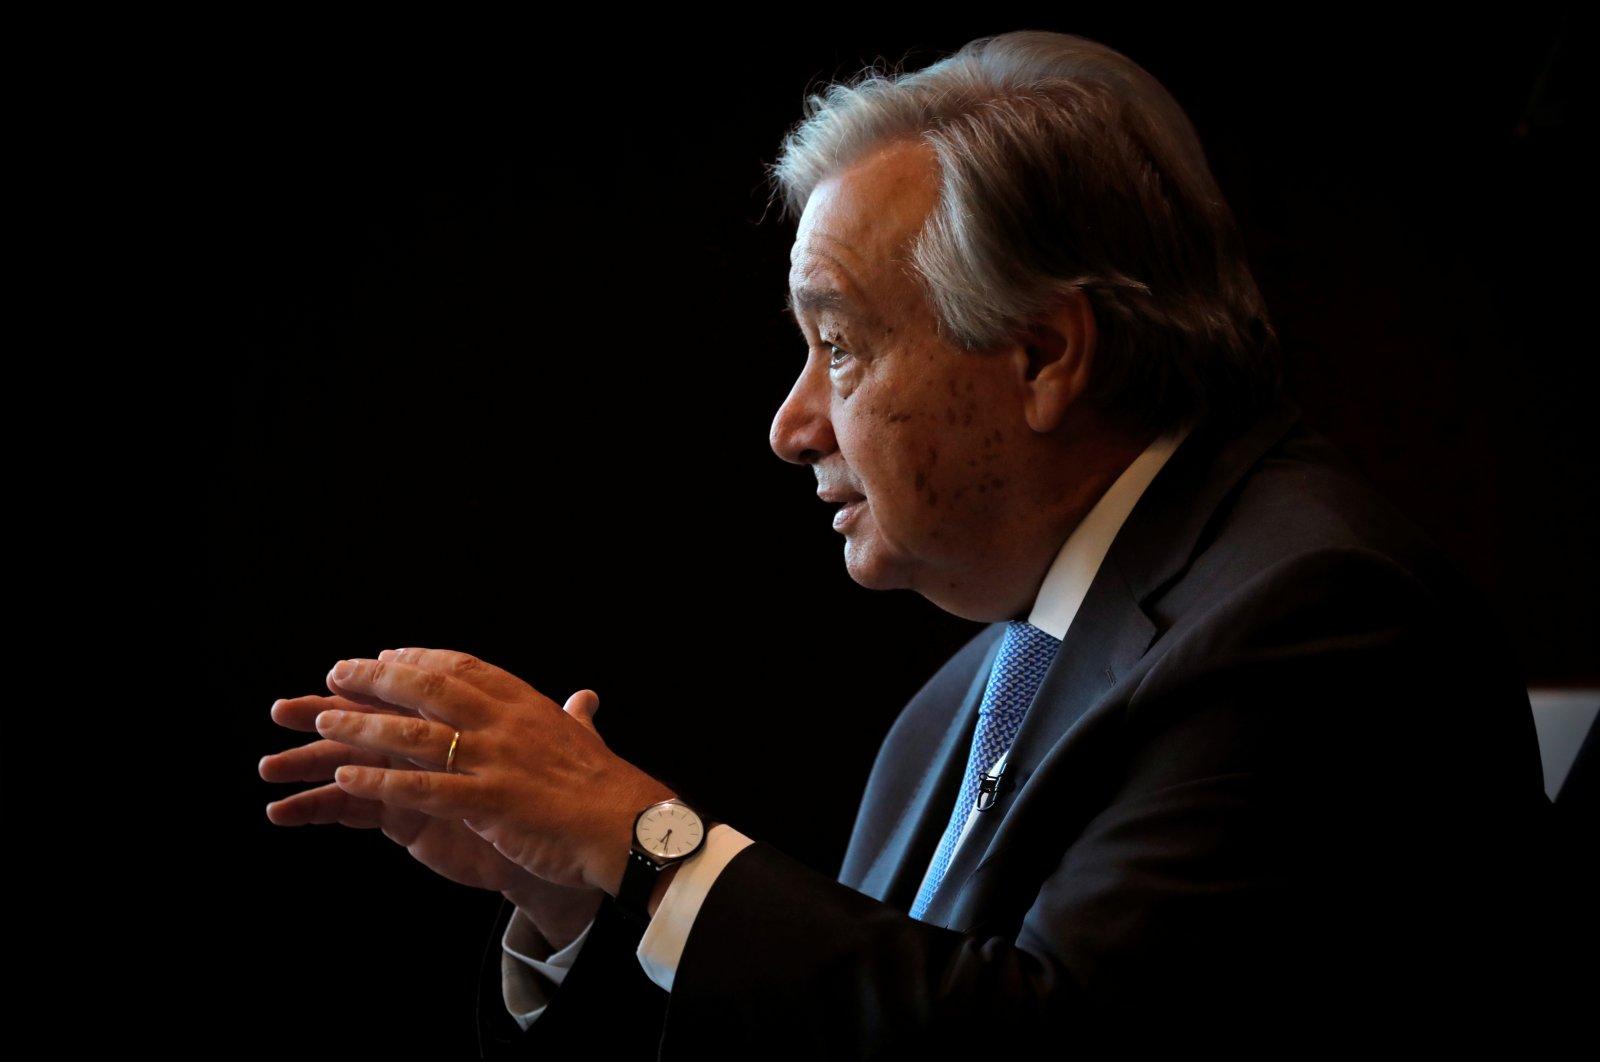 U.N. Secretary-General Antonio Guterres speaks during an interview with Reuters at U.N. headquarters in New York City, New York, U.S., Sept.r 14, 2020. (Reuters Photo)